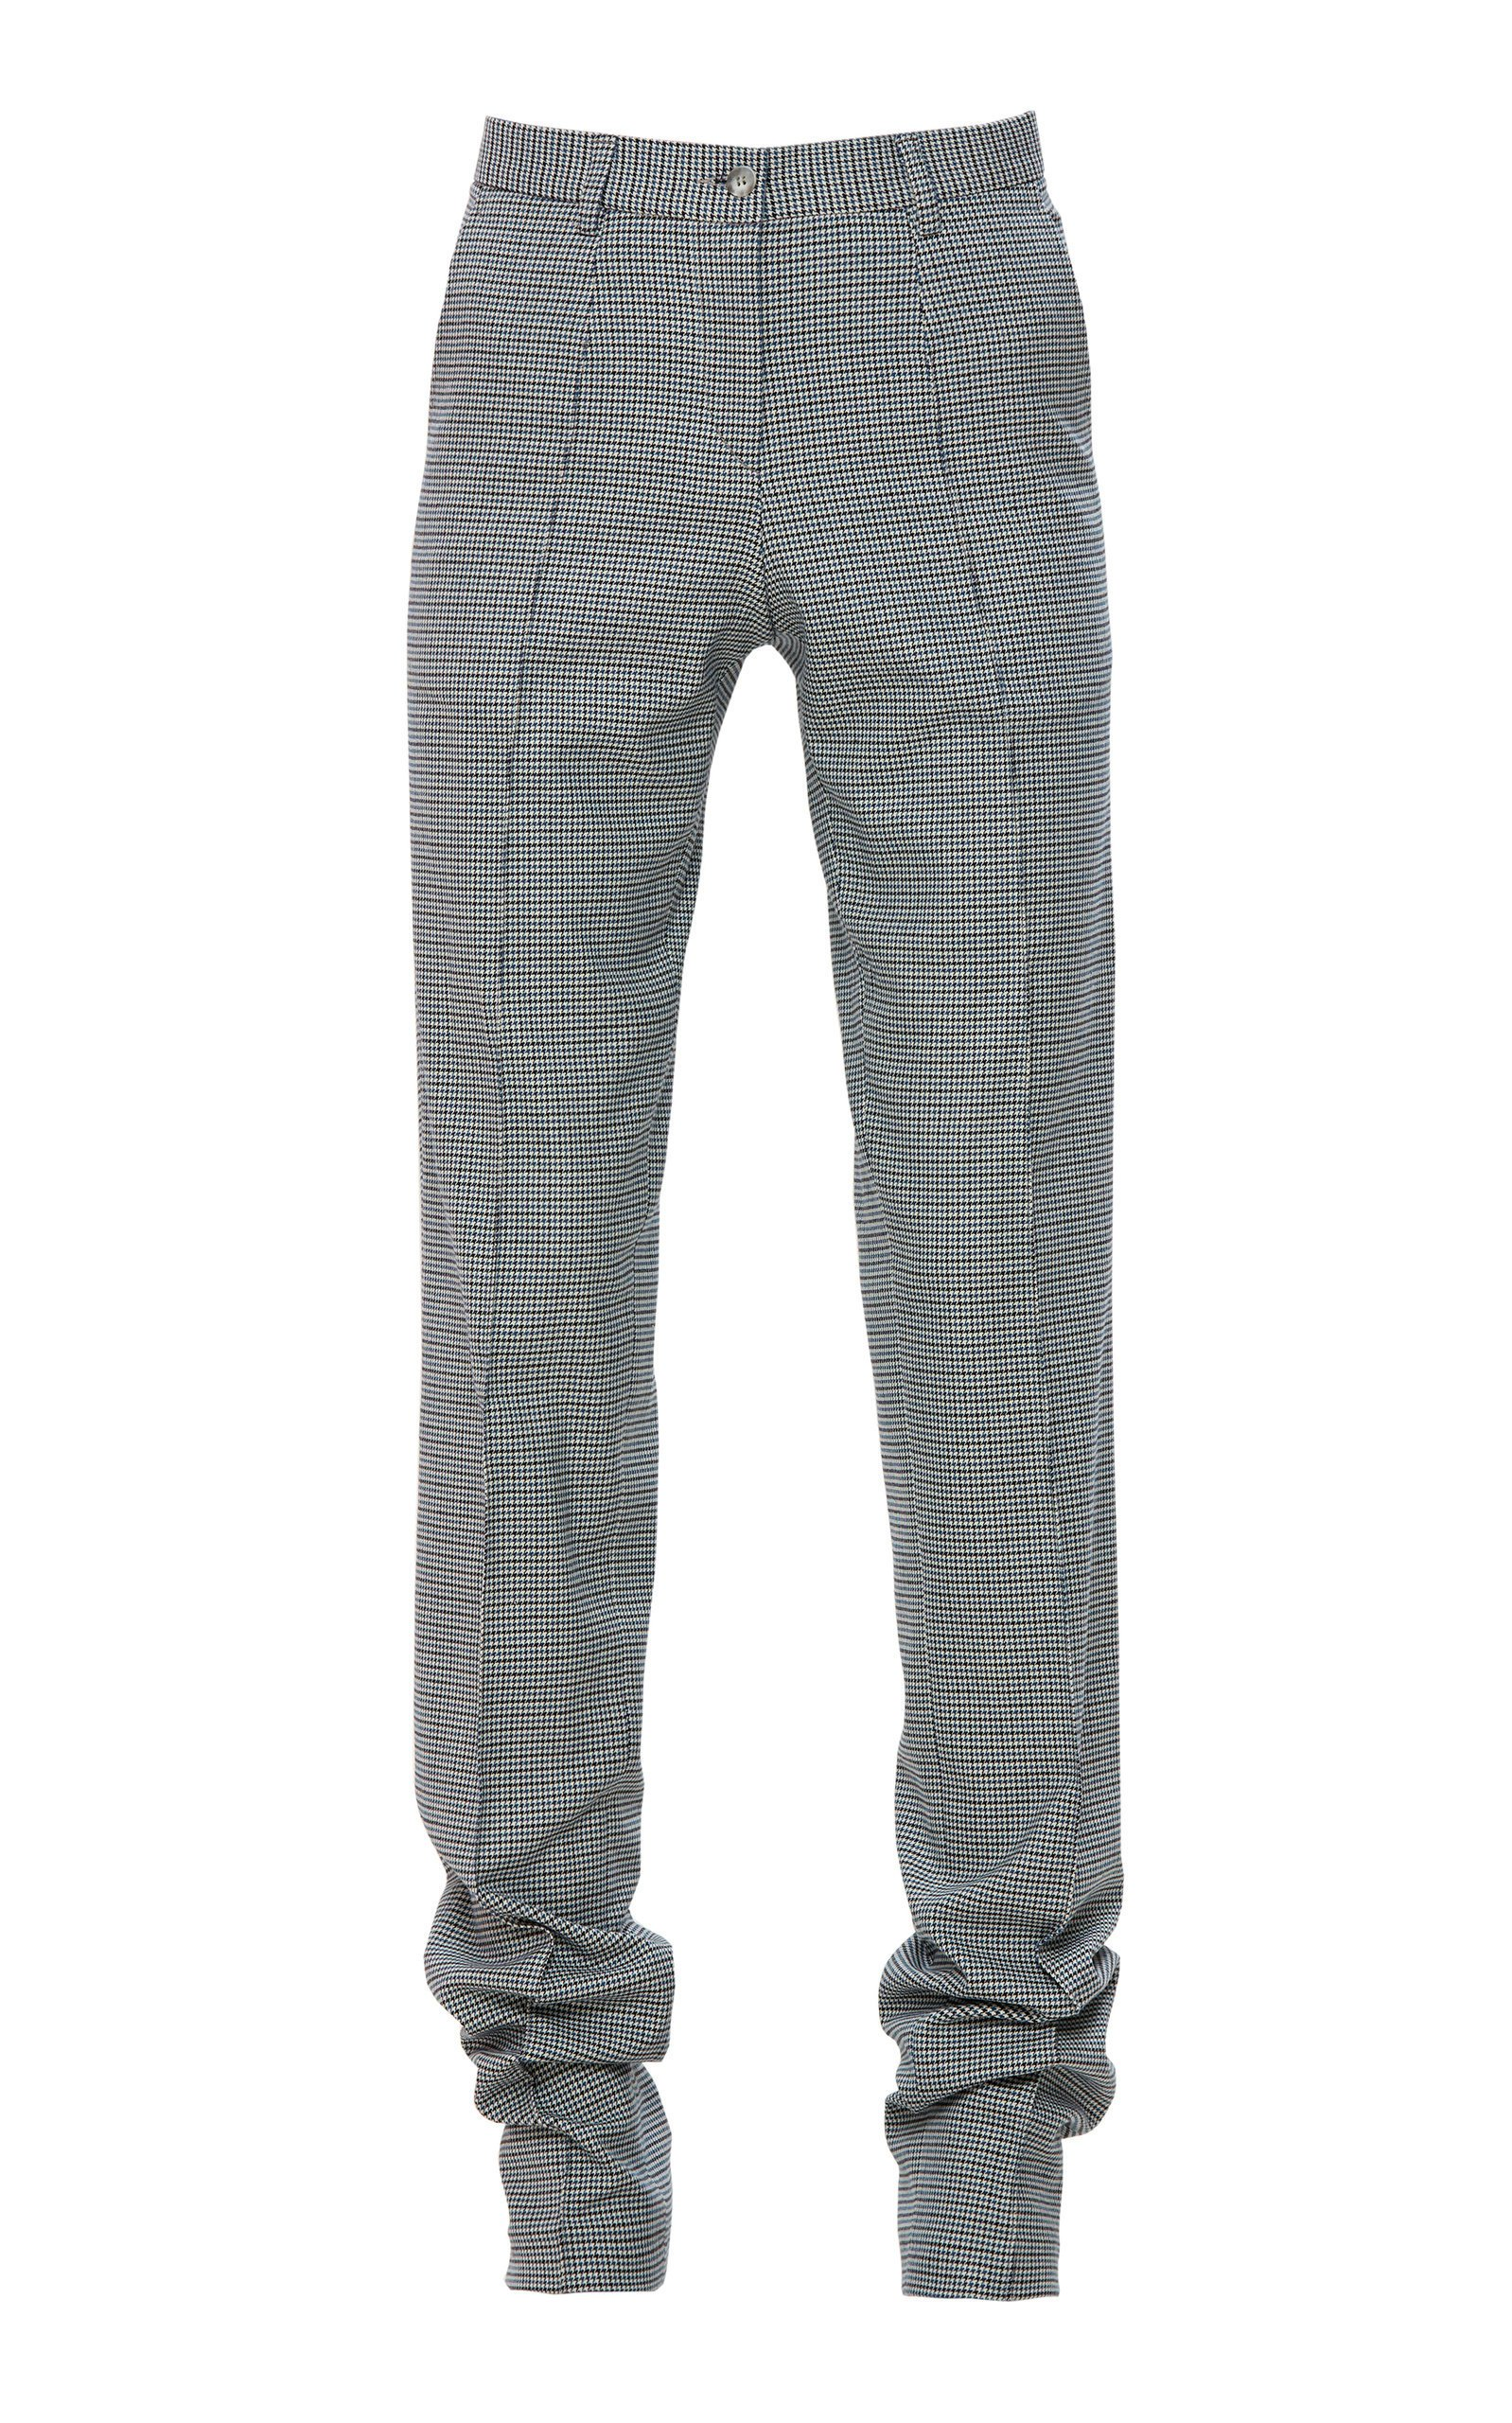 Mach & Mach Skinny Blue Check Trousers